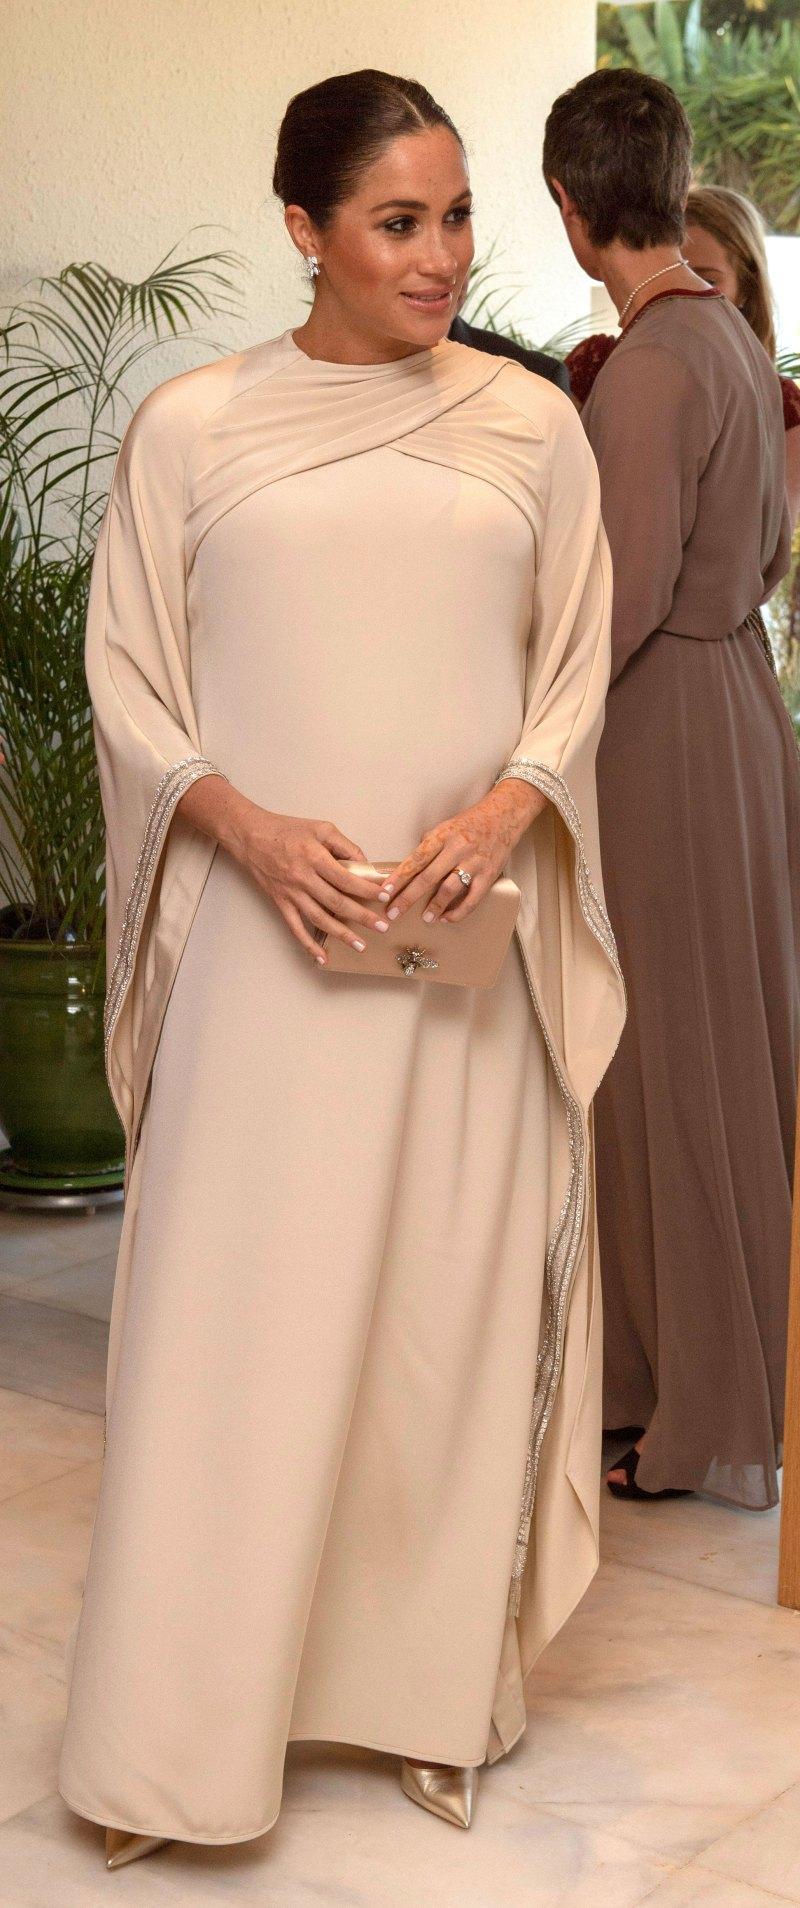 82f61e73b69 Couture Pregnancy Dresses - Gomes Weine AG